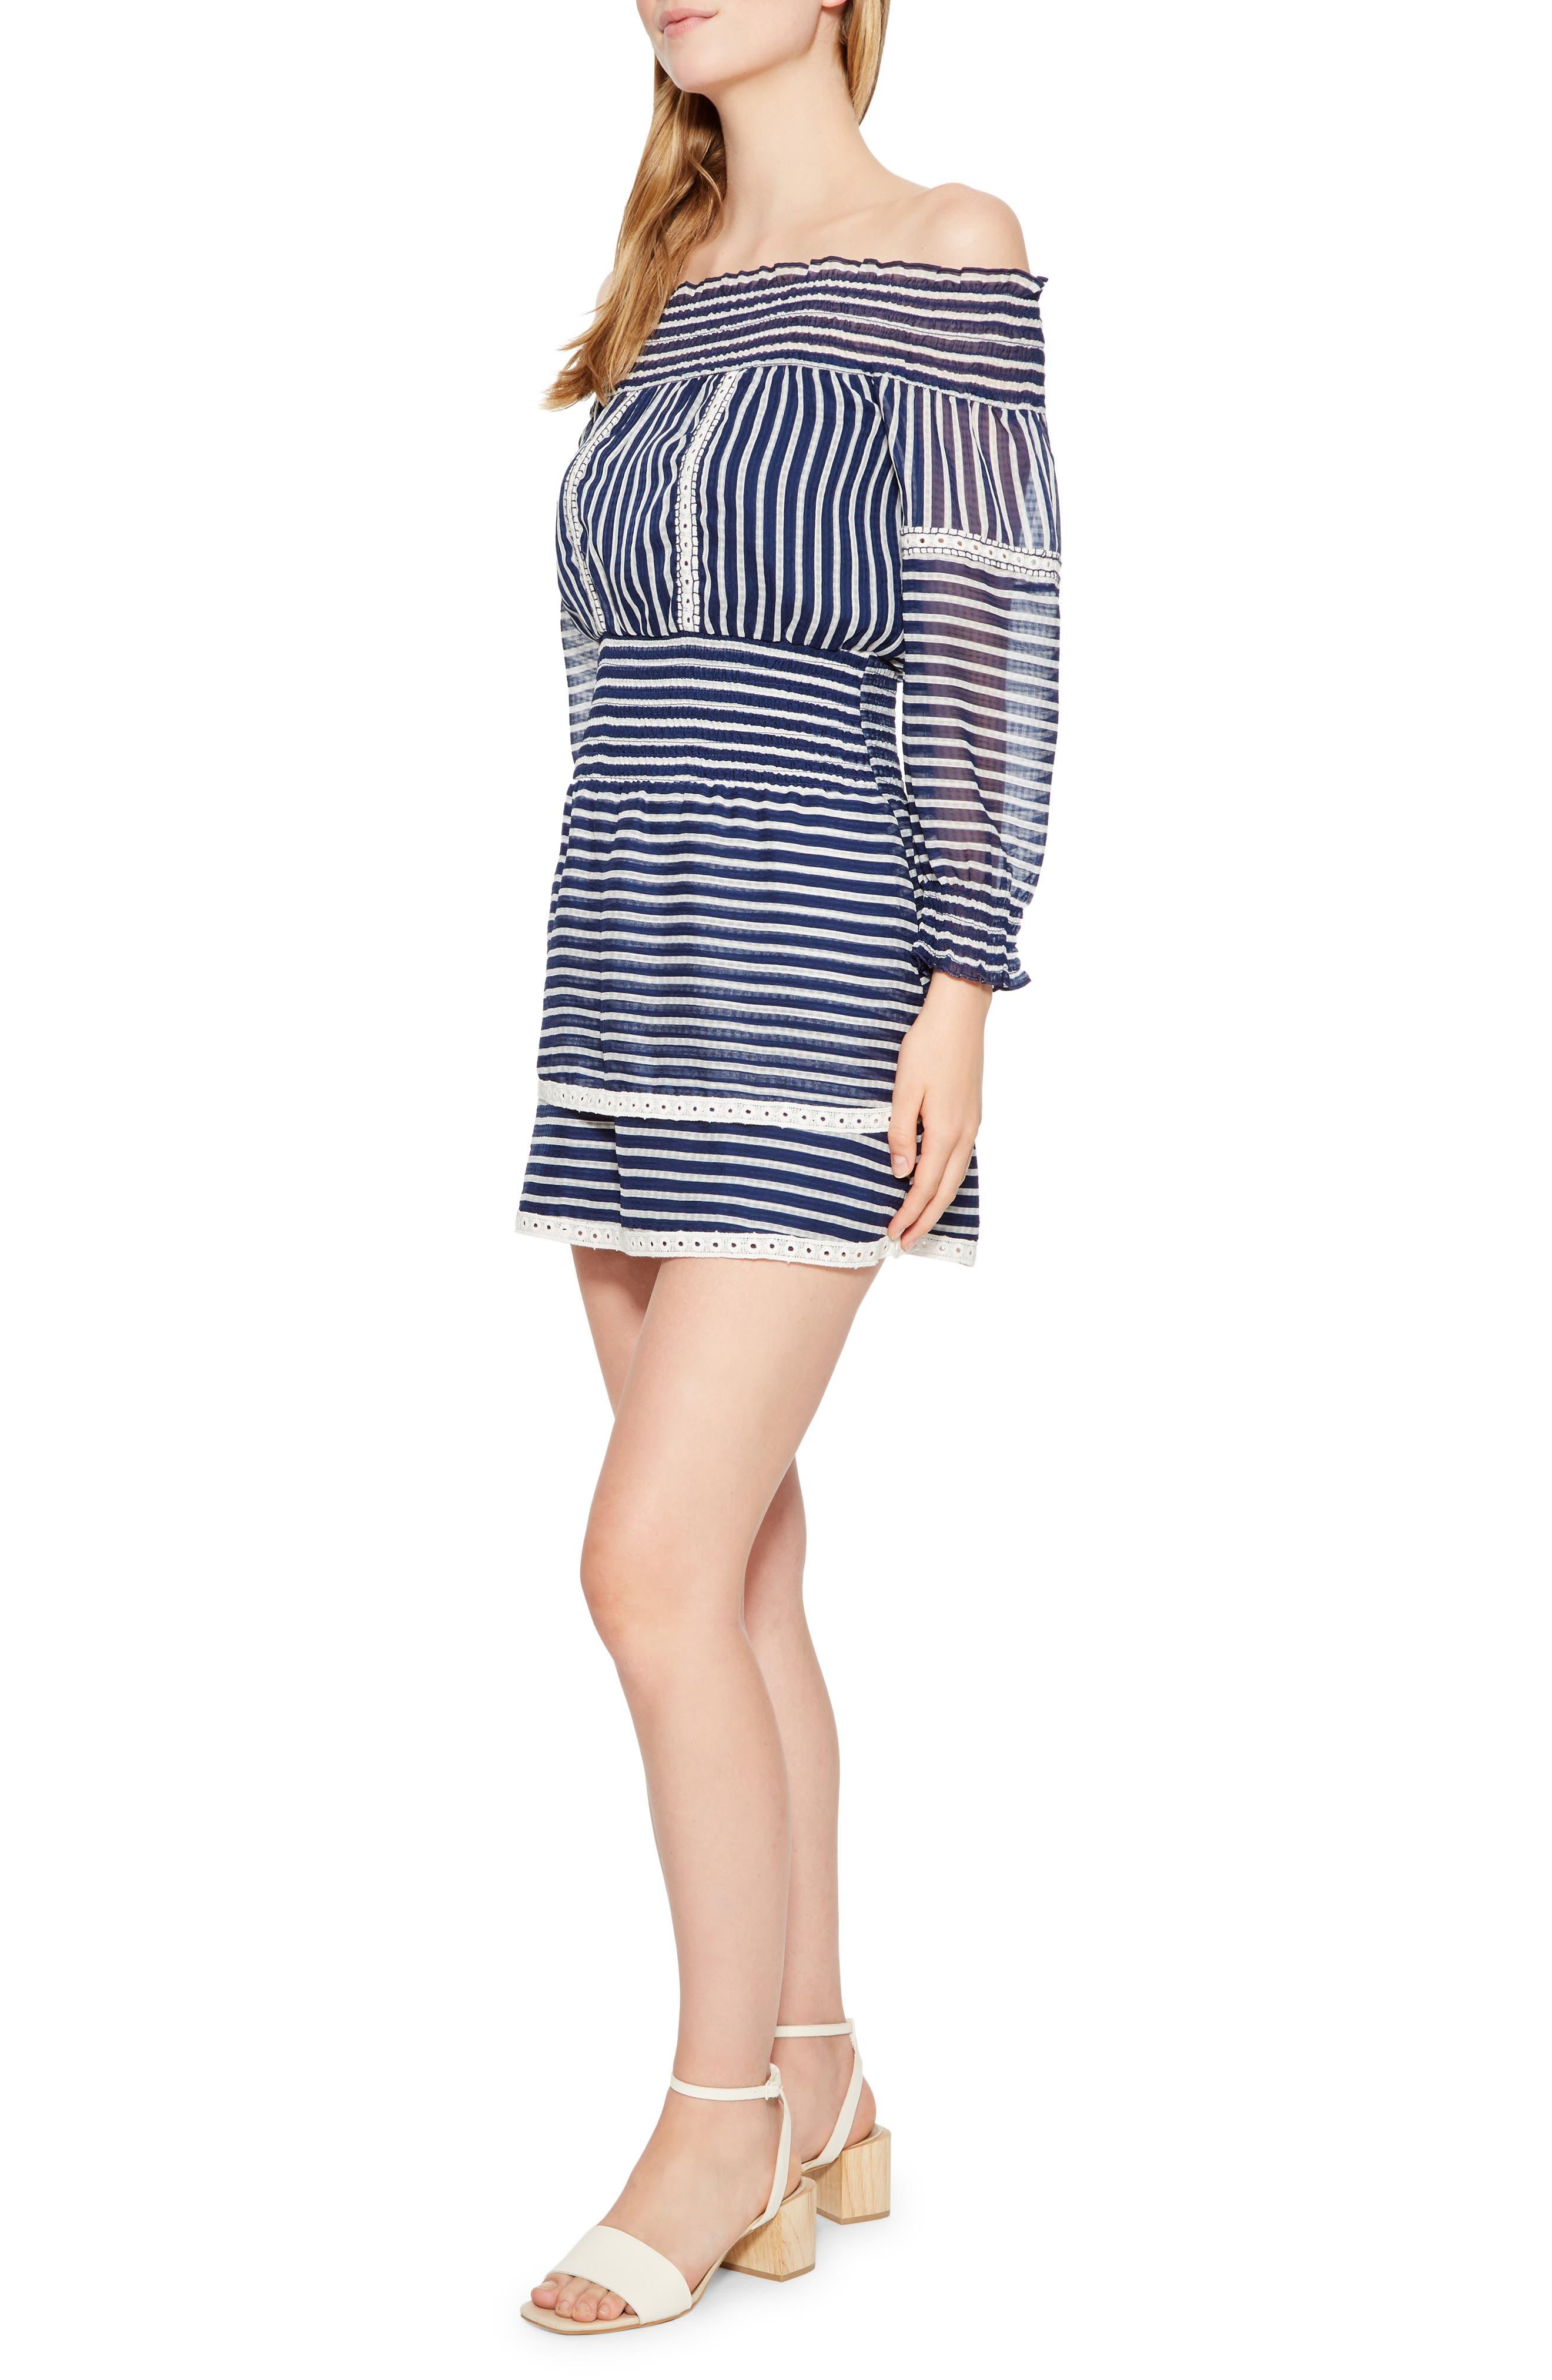 Carah Stripe Off the Shoulder Dress,                             Alternate thumbnail 3, color,                             496